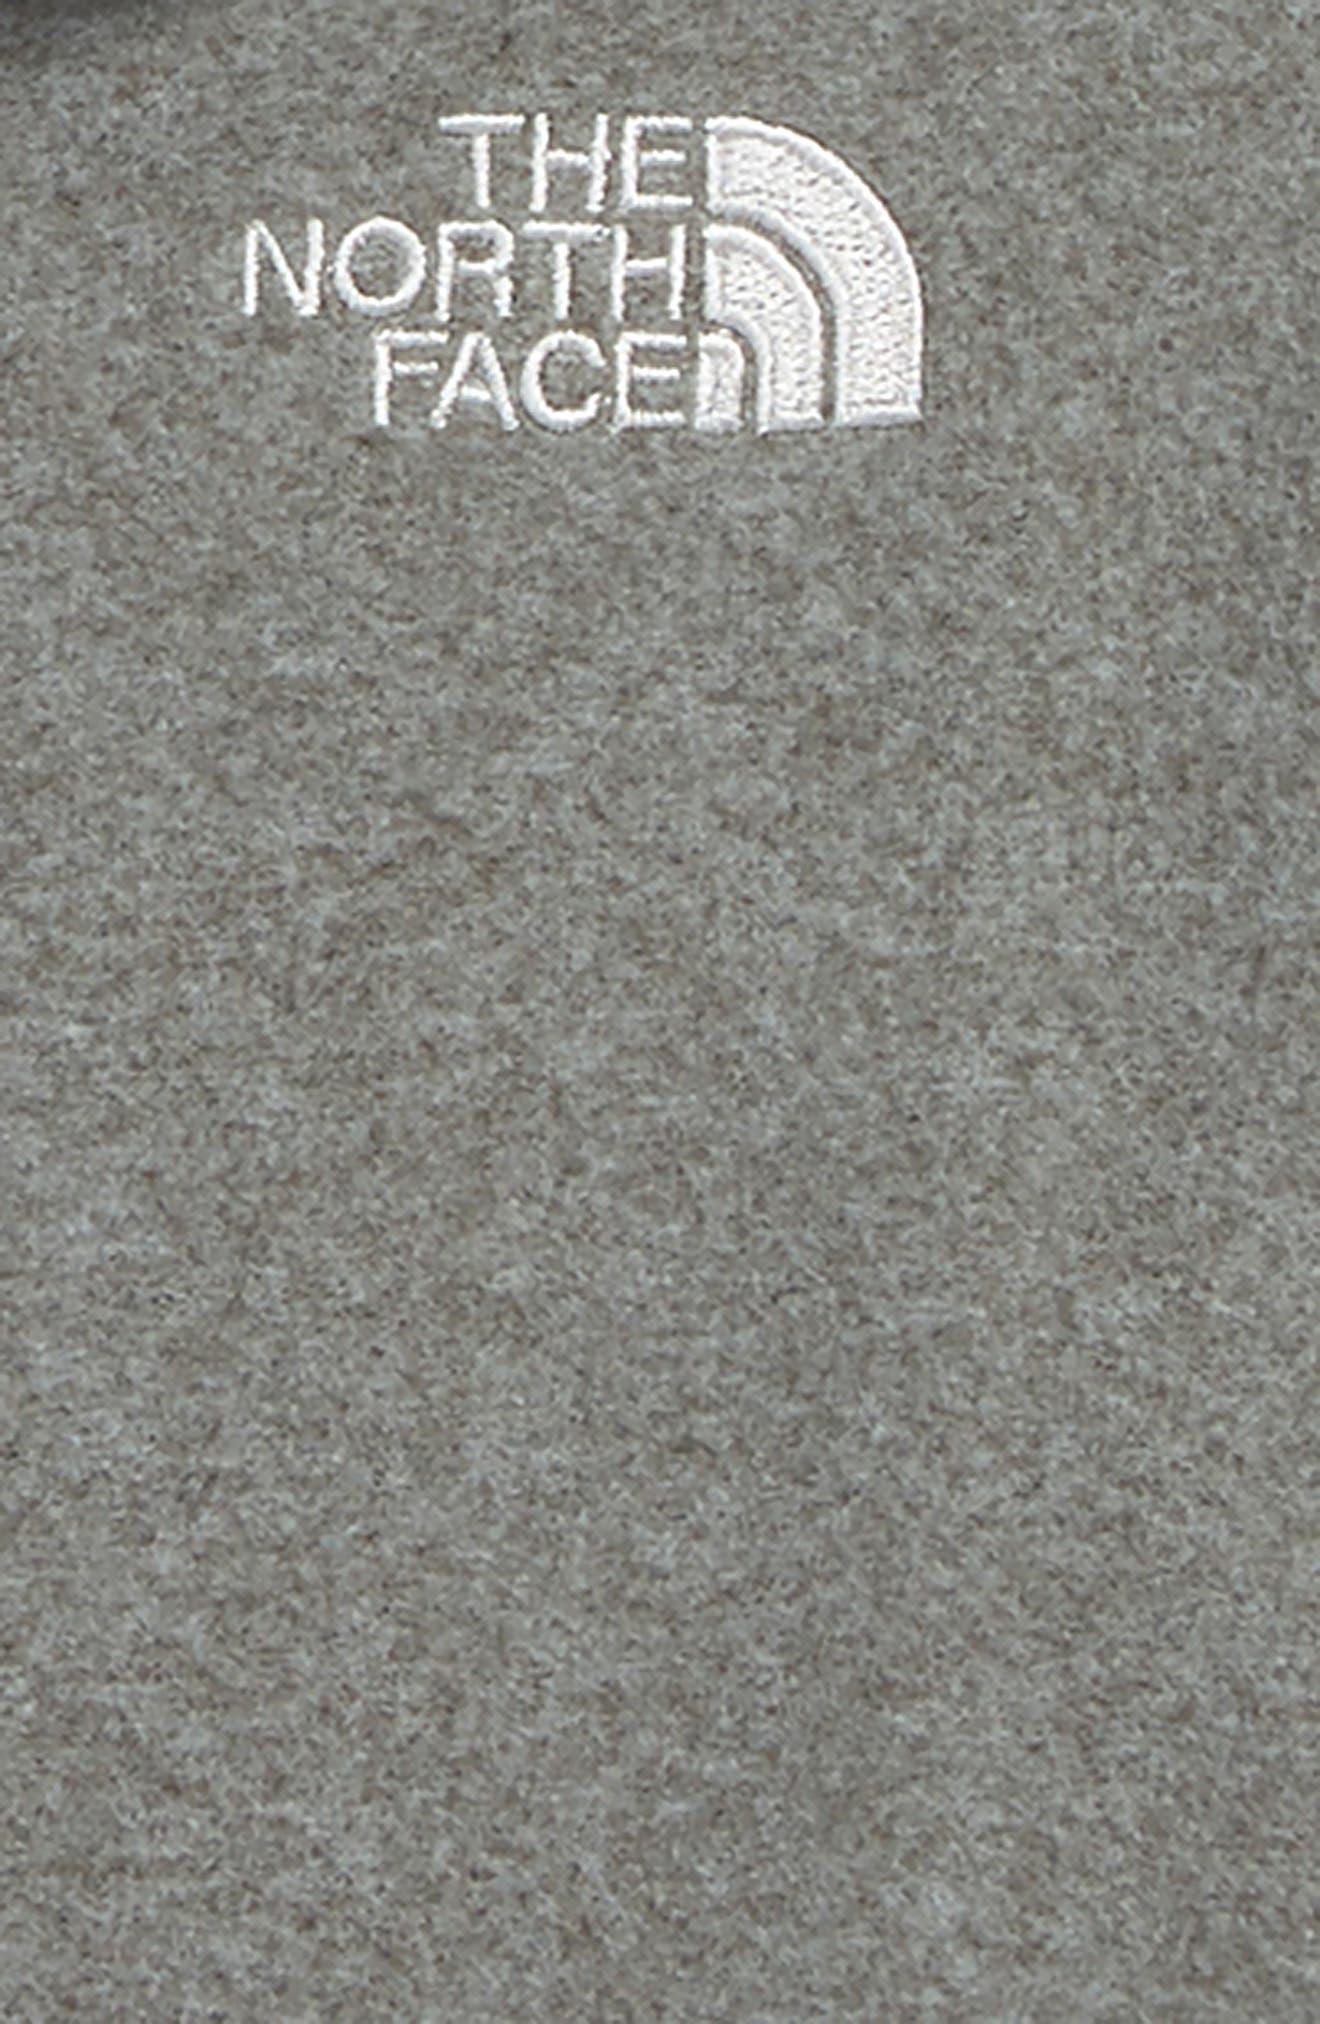 THE NORTH FACE, Glacier Full Zip Fleece Hoodie, Alternate thumbnail 2, color, TNF MEDIUM GREY HEATHER